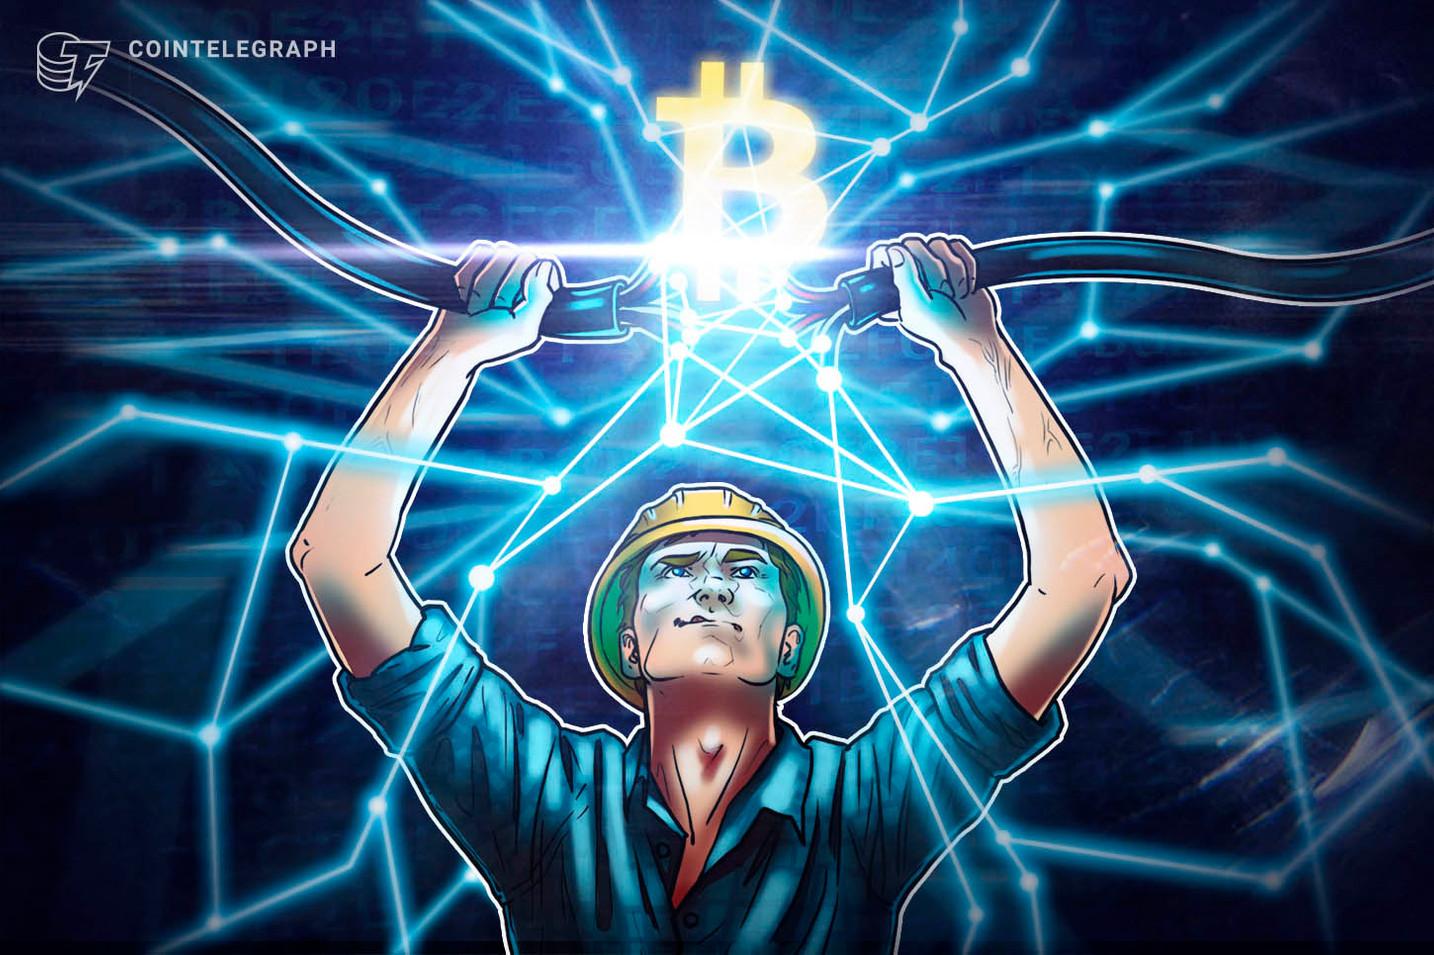 Democratizing Bitcoin's hashrate takes center stage at mining summit